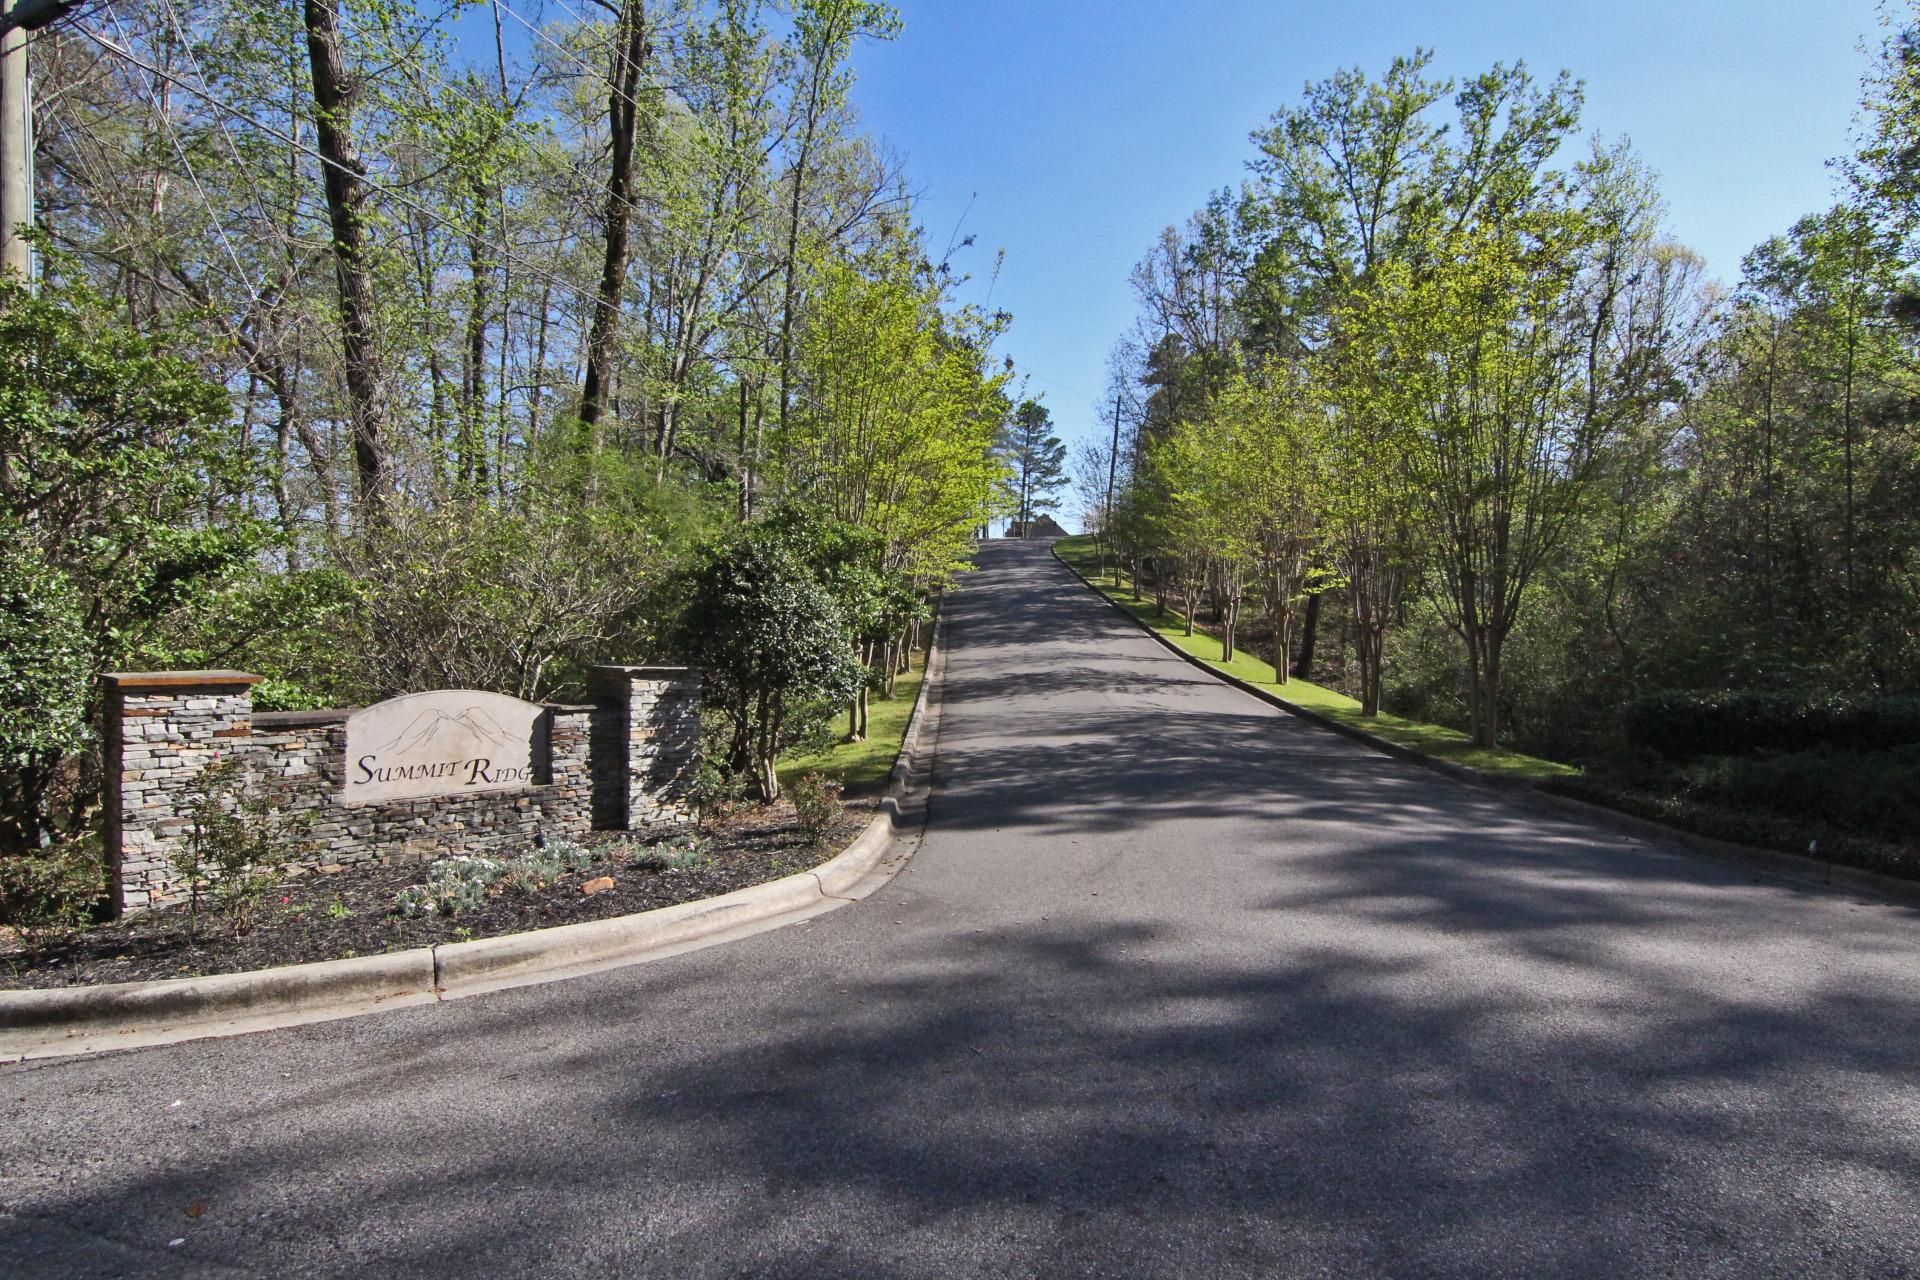 Summit Ridge Entrance, Odenville, AL